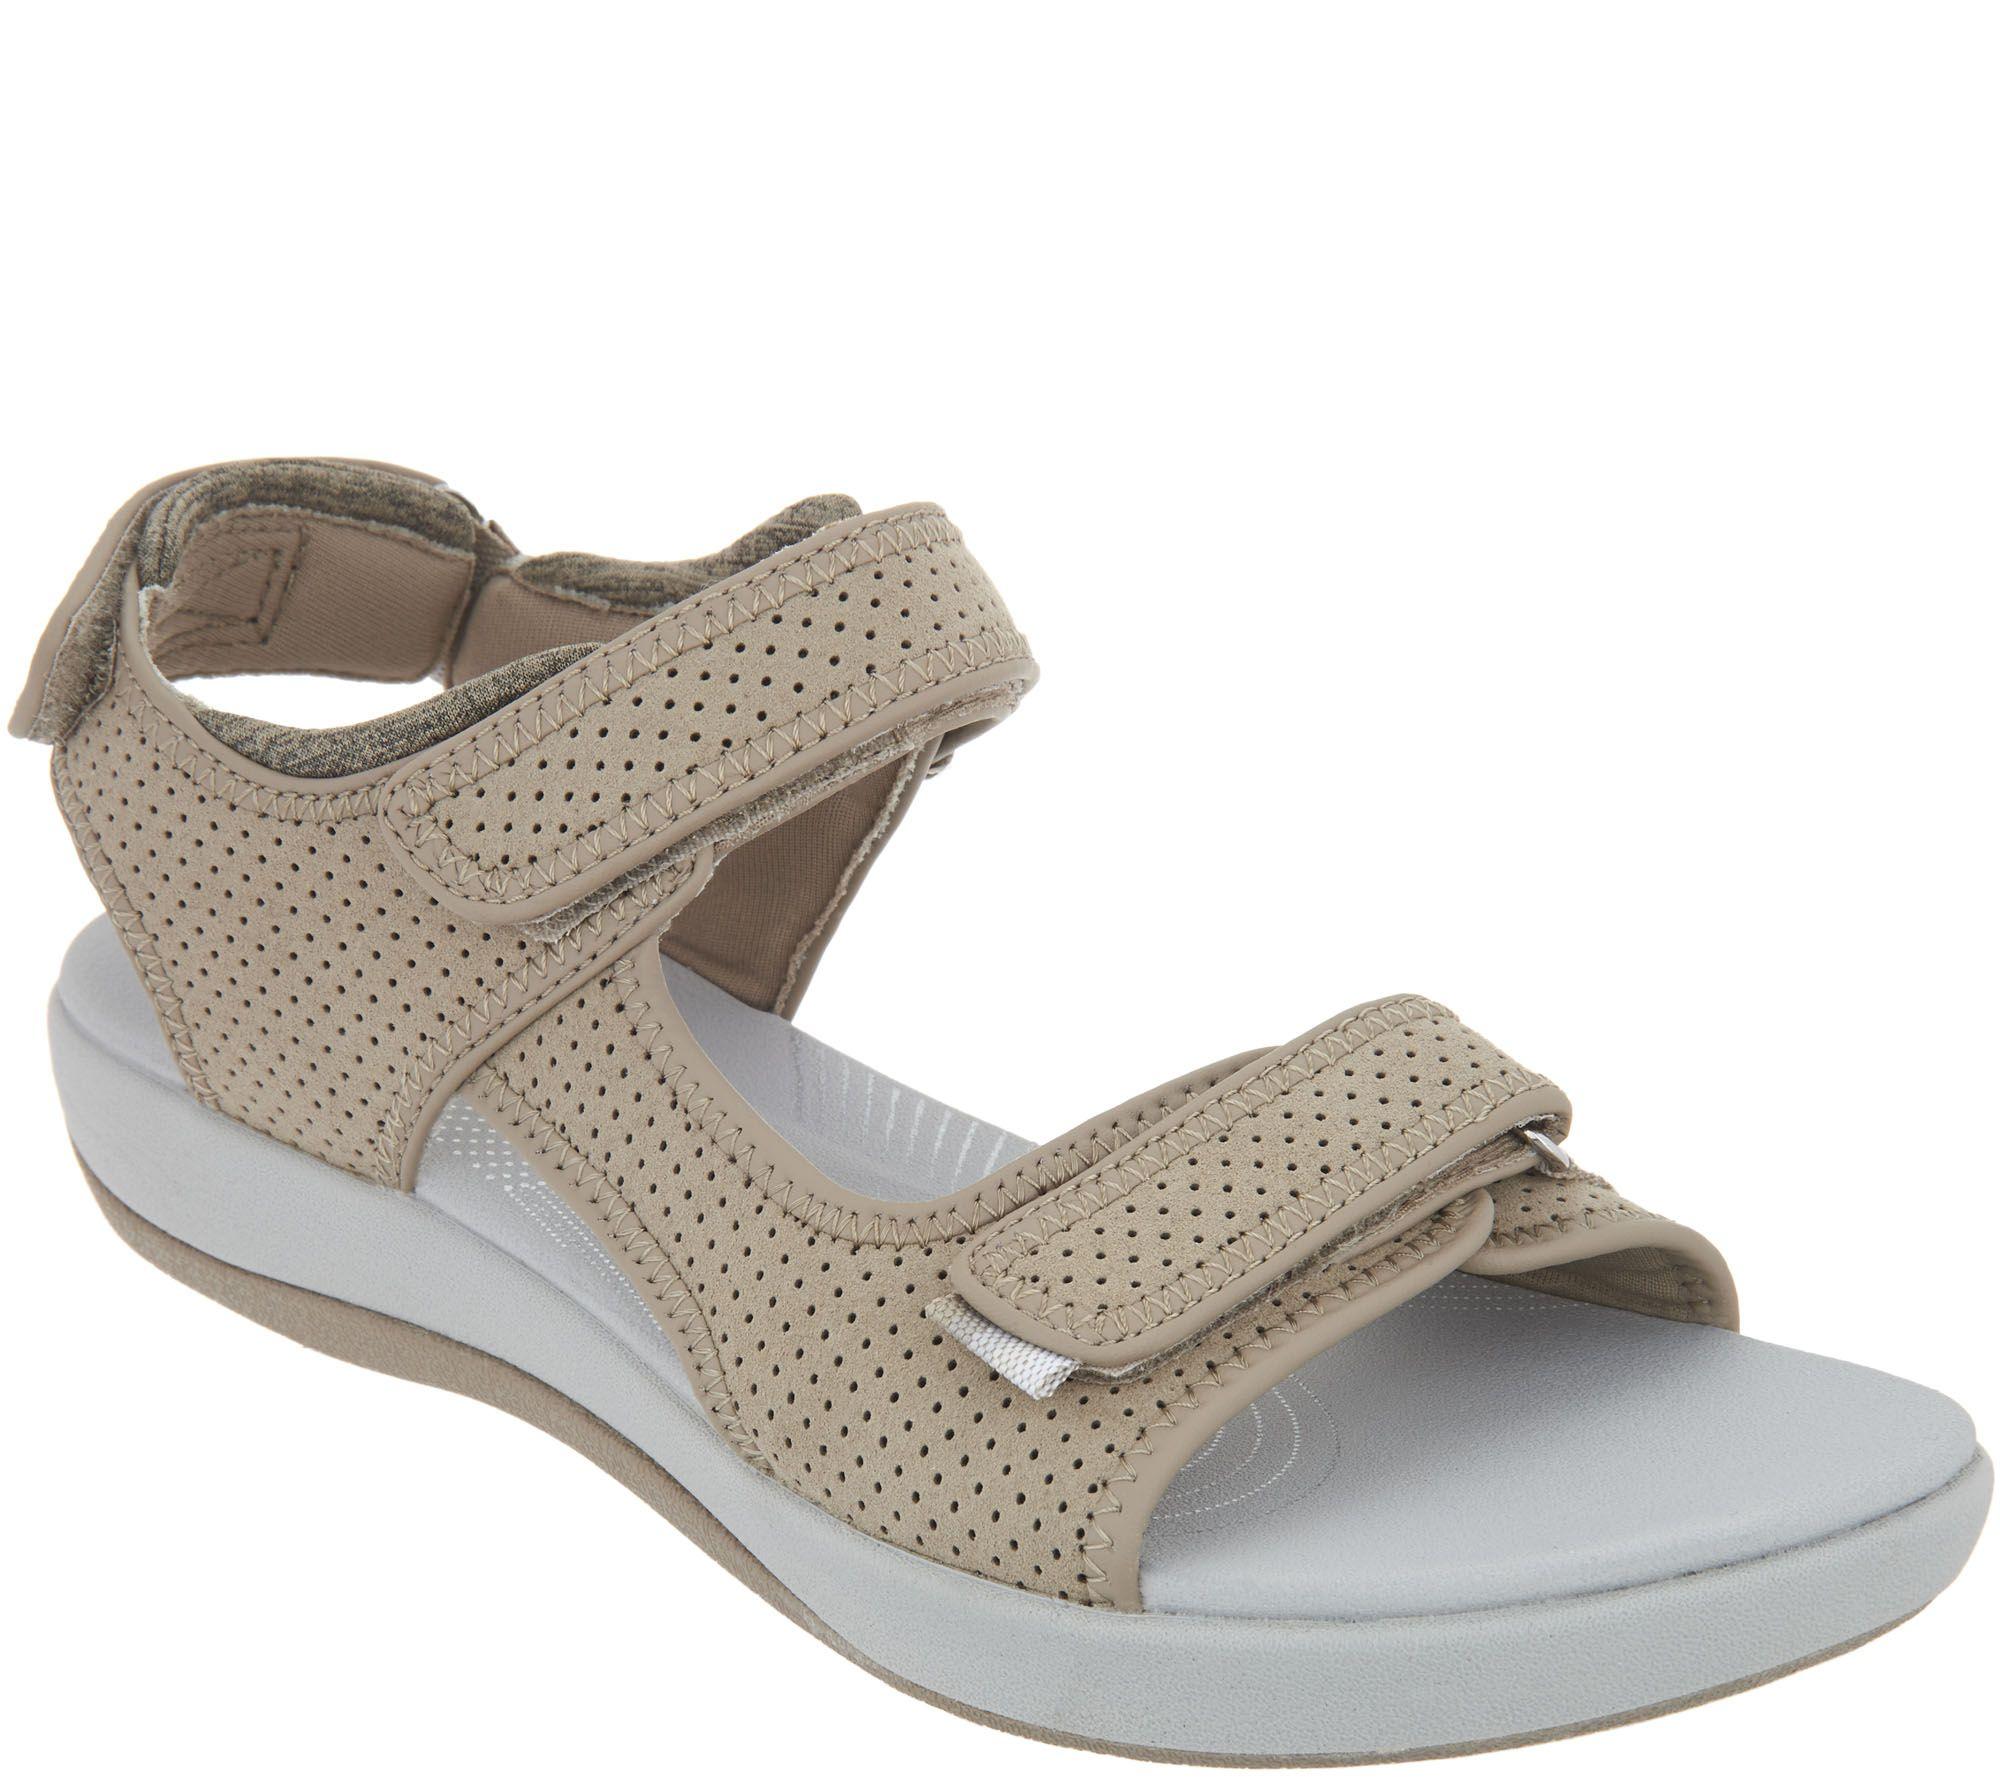 5f5768f5de3 CLOUDSTEPPERS by Clarks Adjustable Sport Sandals - Brizo Sammie - Page 1 —  QVC.com